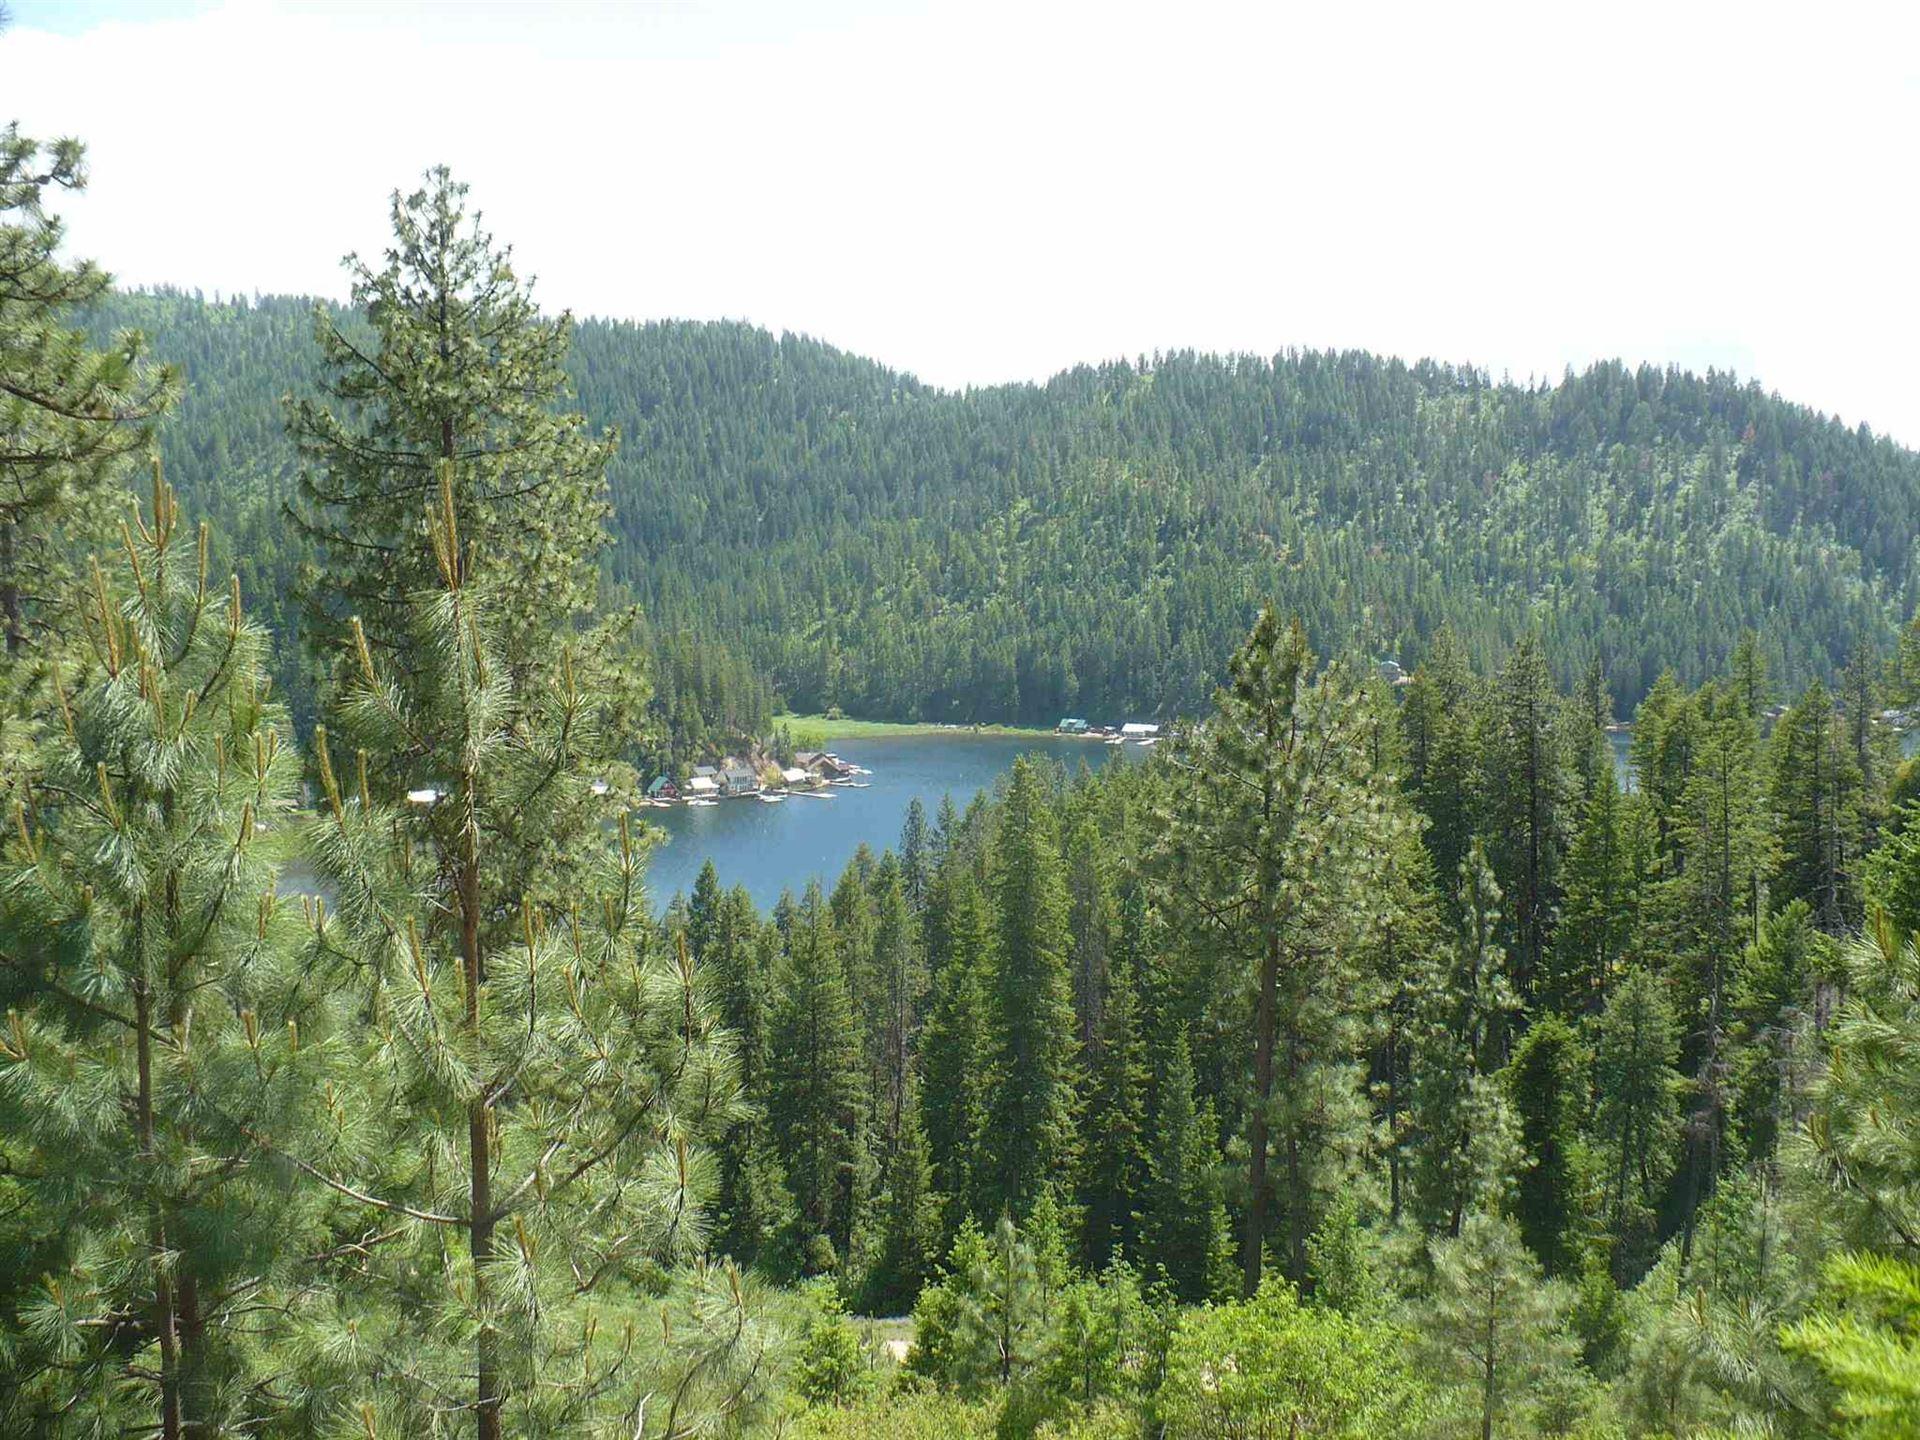 4139 N Deer Lake Rd #Lot 5, Loon Lake, WA 99148 - #: 202116774